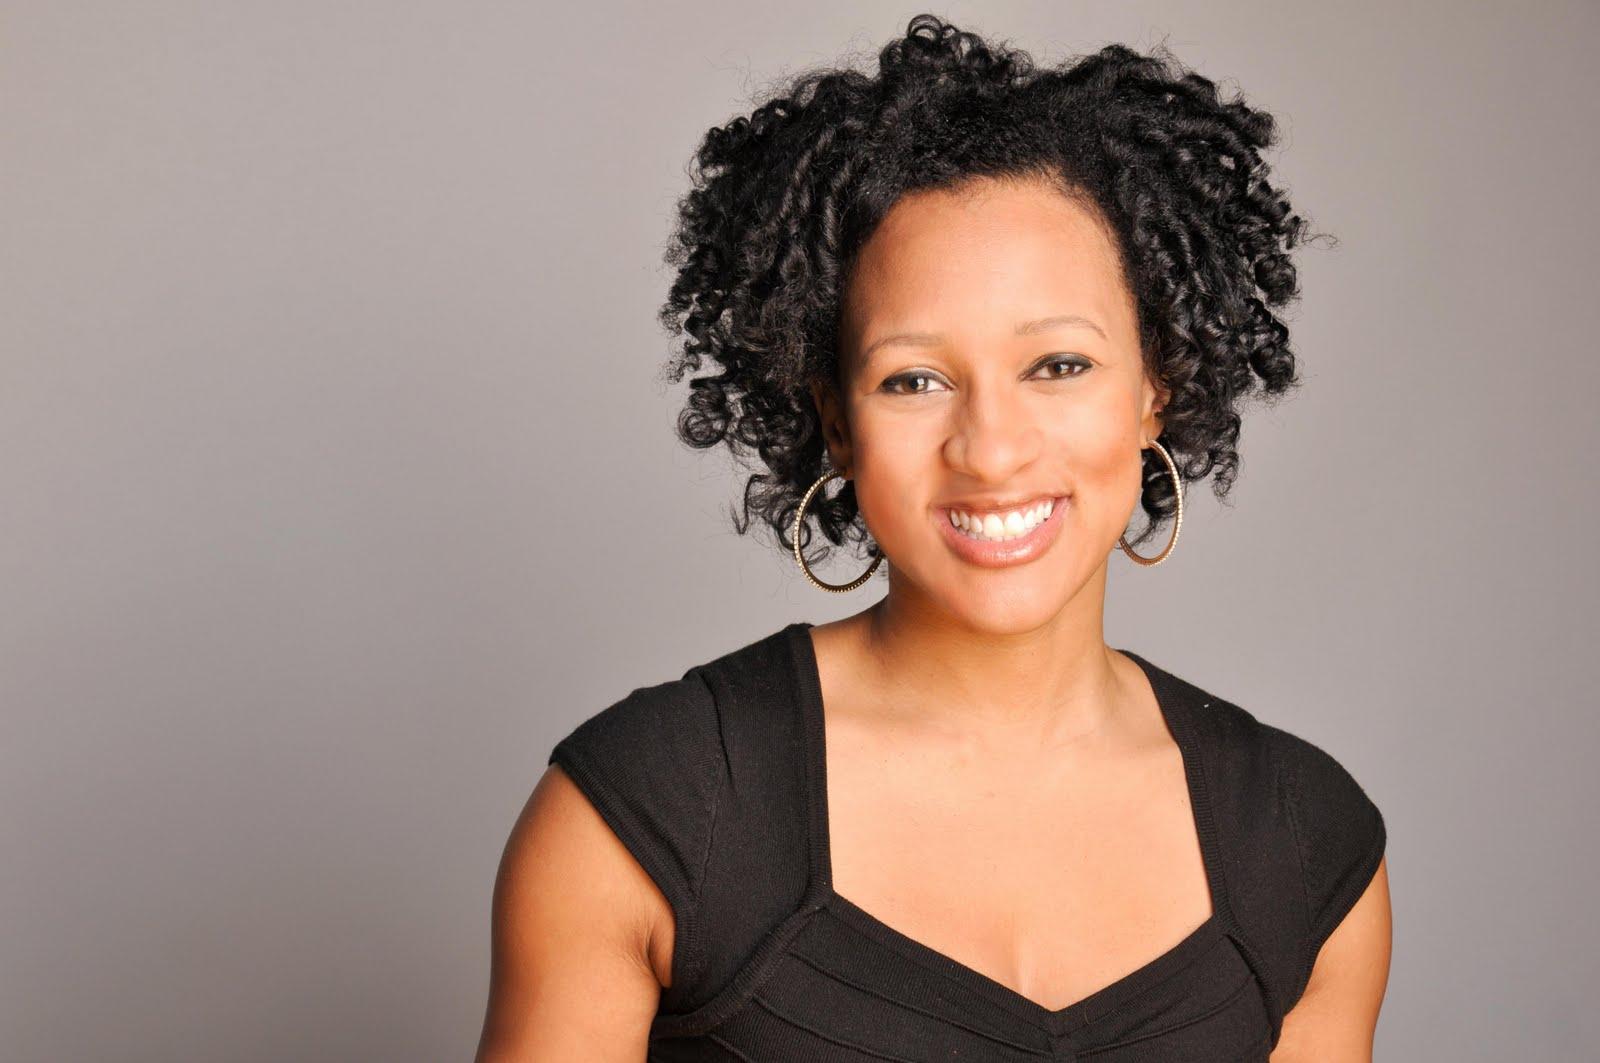 Short Hairstyles For Black Women Natural Hair – Hairstyle For Women Inside Short Haircuts For Natural Hair Black Women (View 23 of 25)